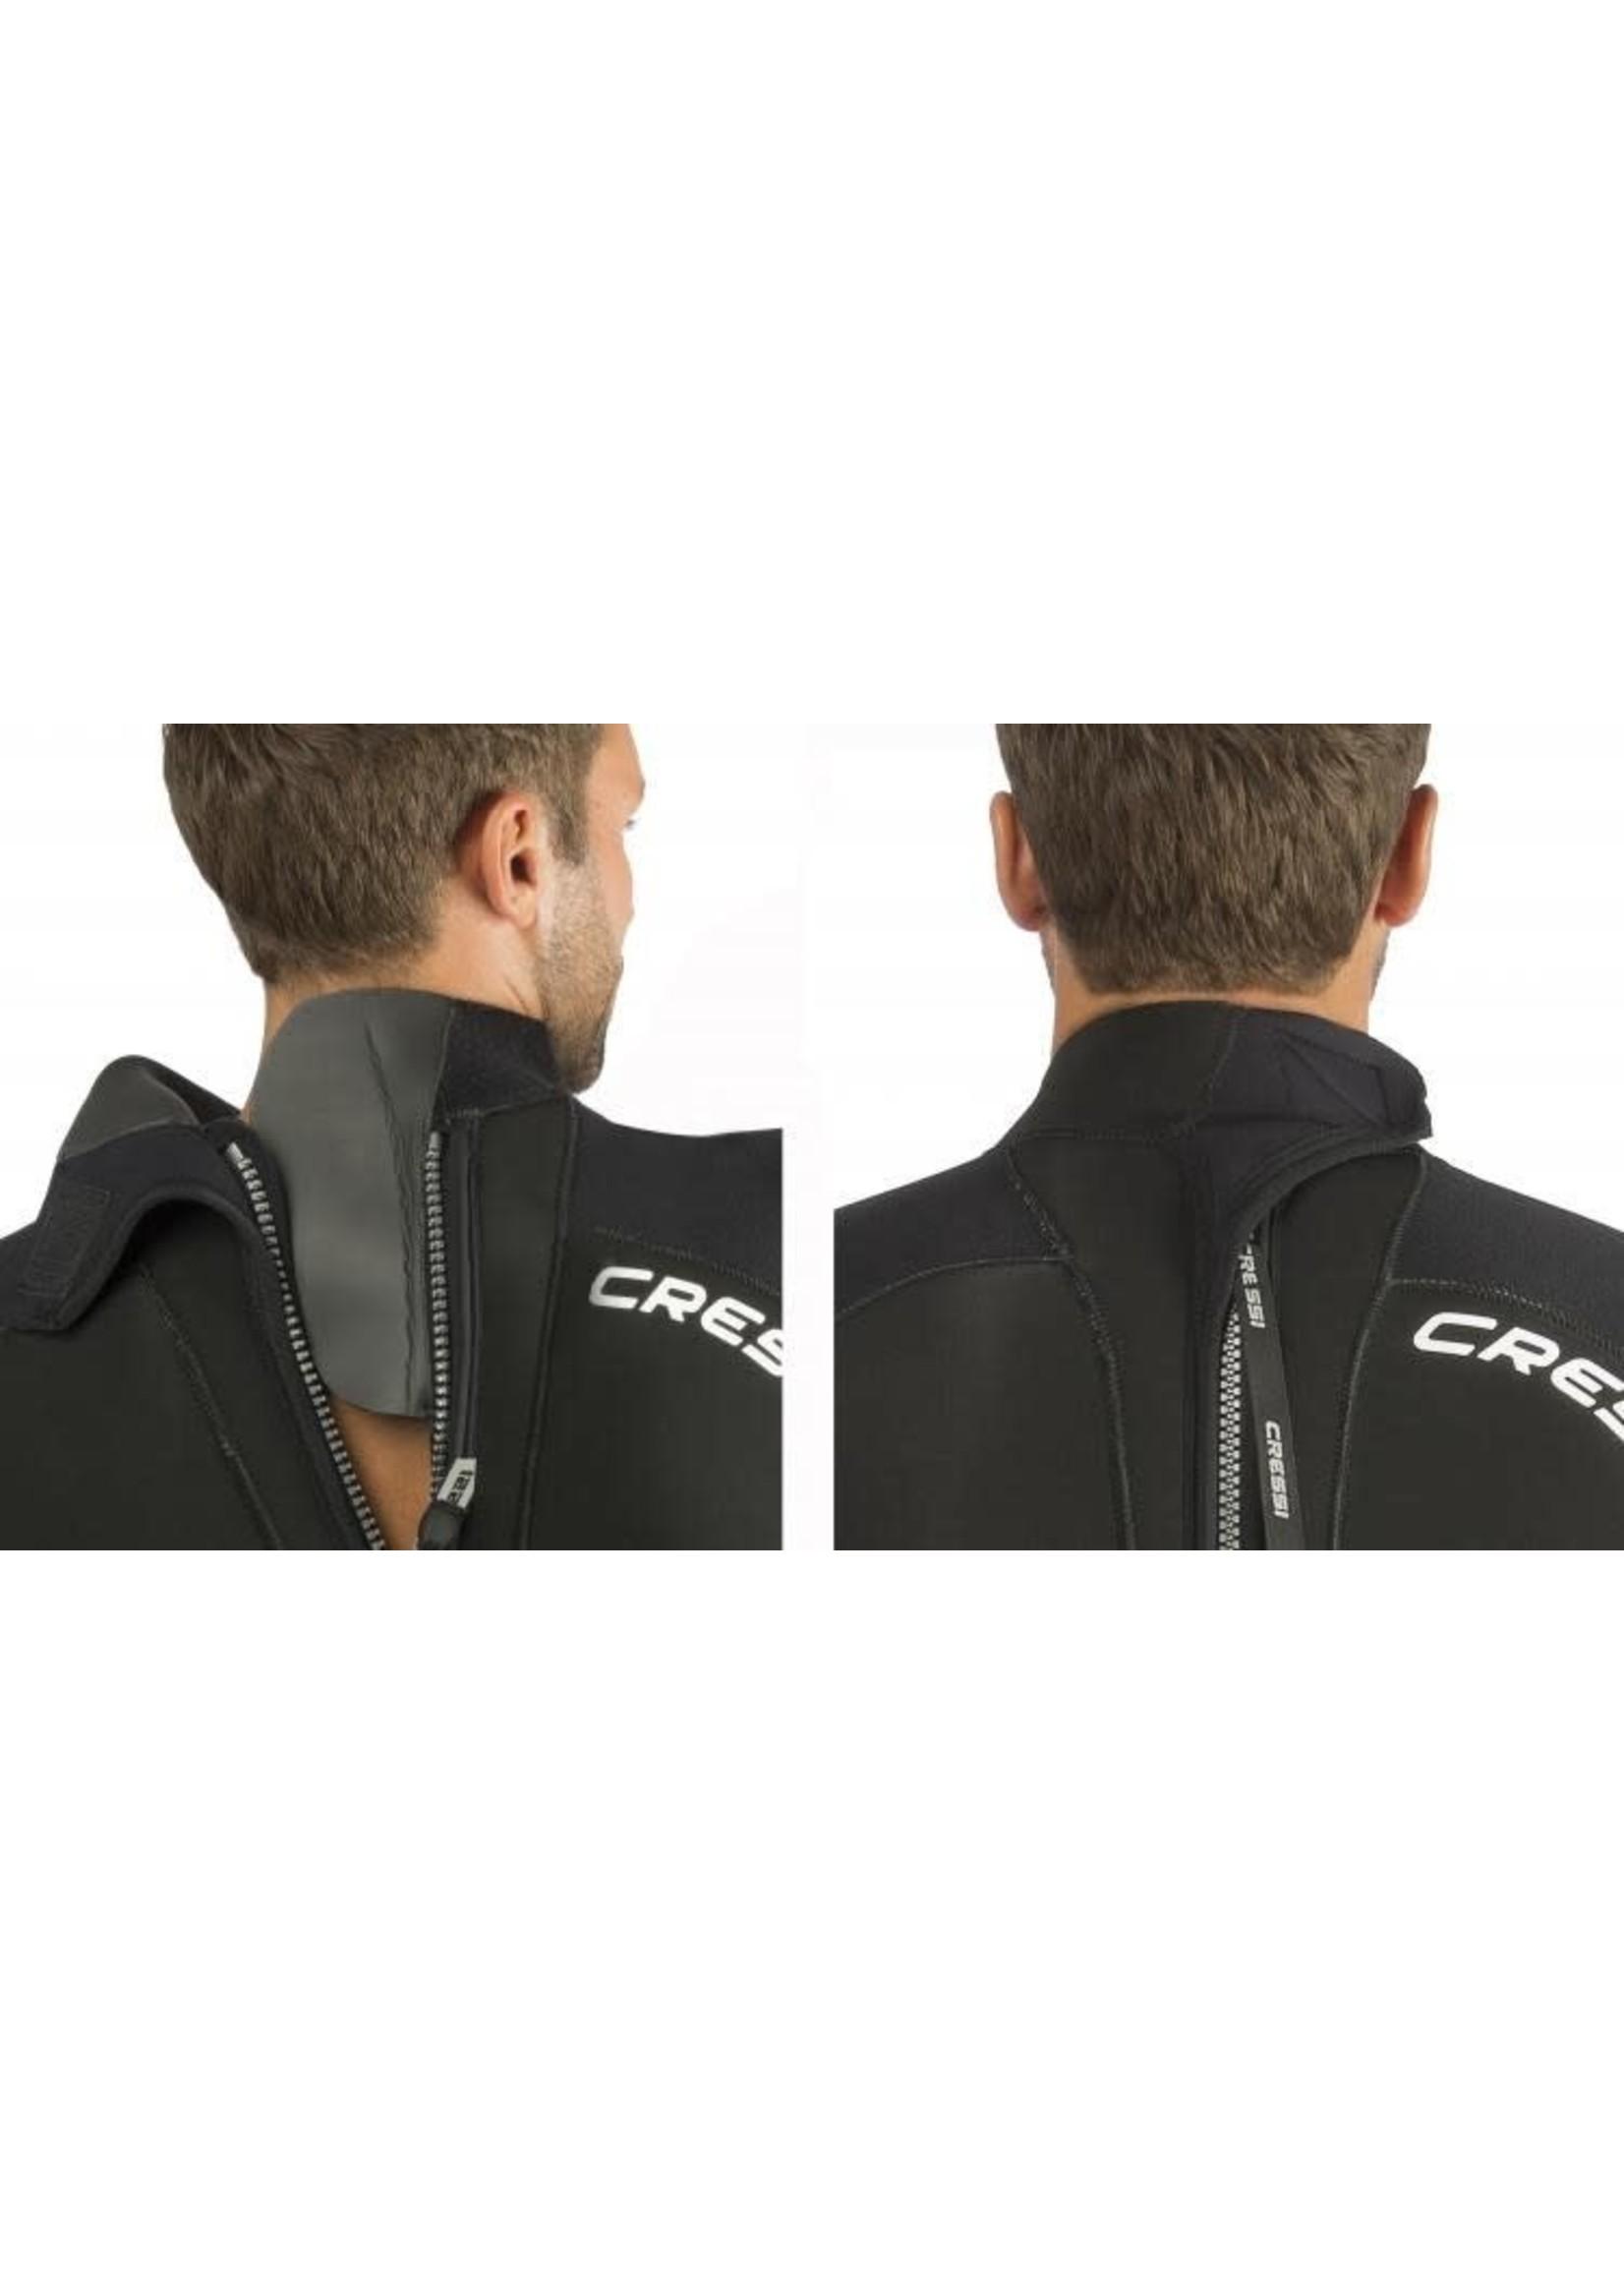 Cressi Cressi Atelier Comfort All-in-One 7mm - man